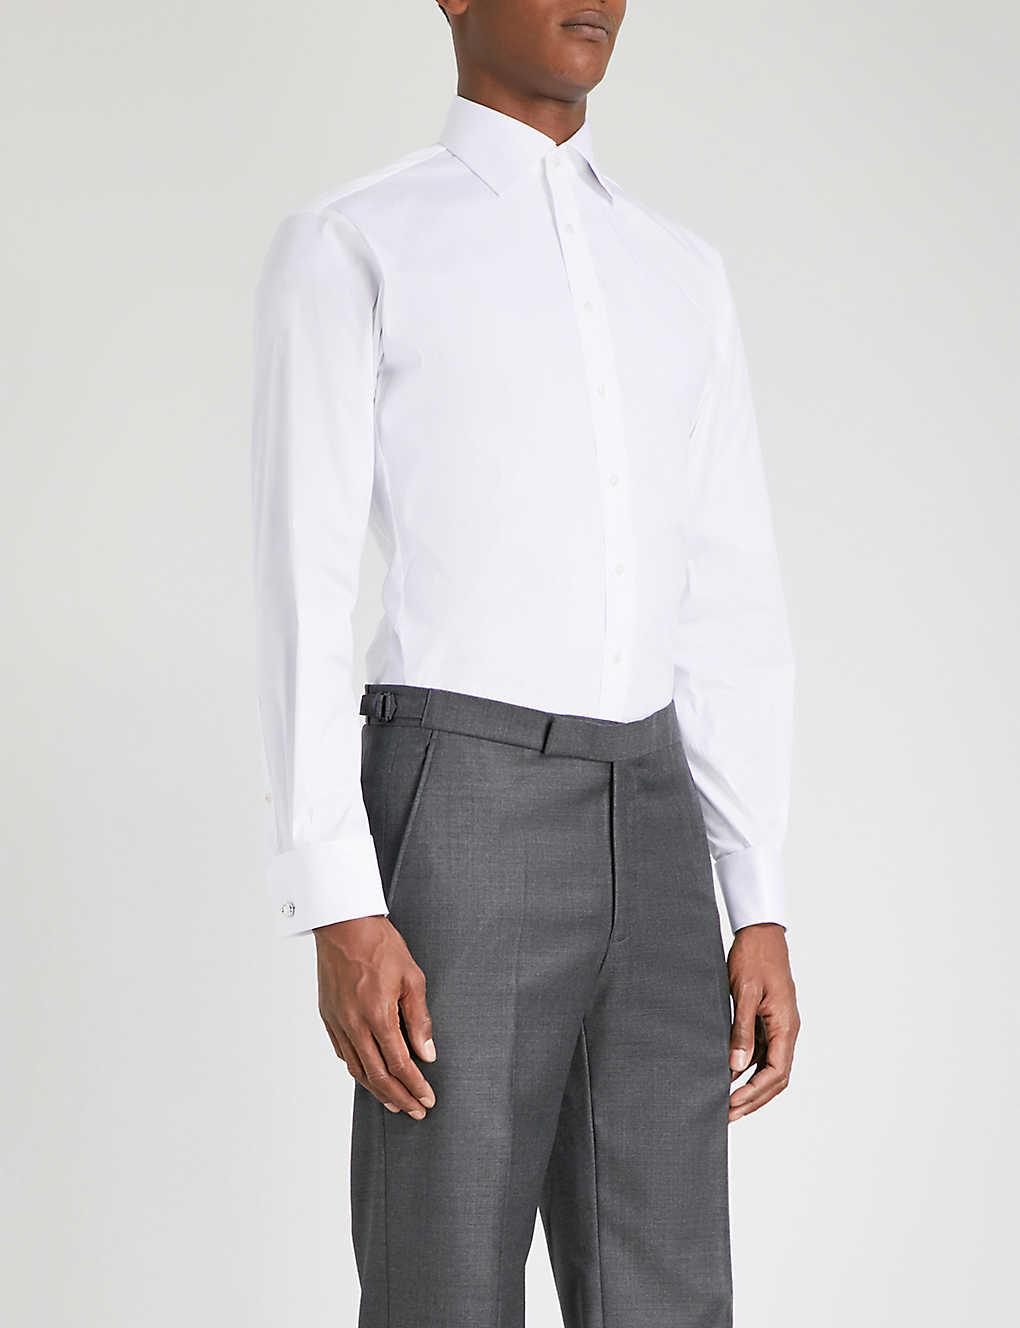 Thomas Pink Athletic Fit Stretch Cotton Shirt Selfridges